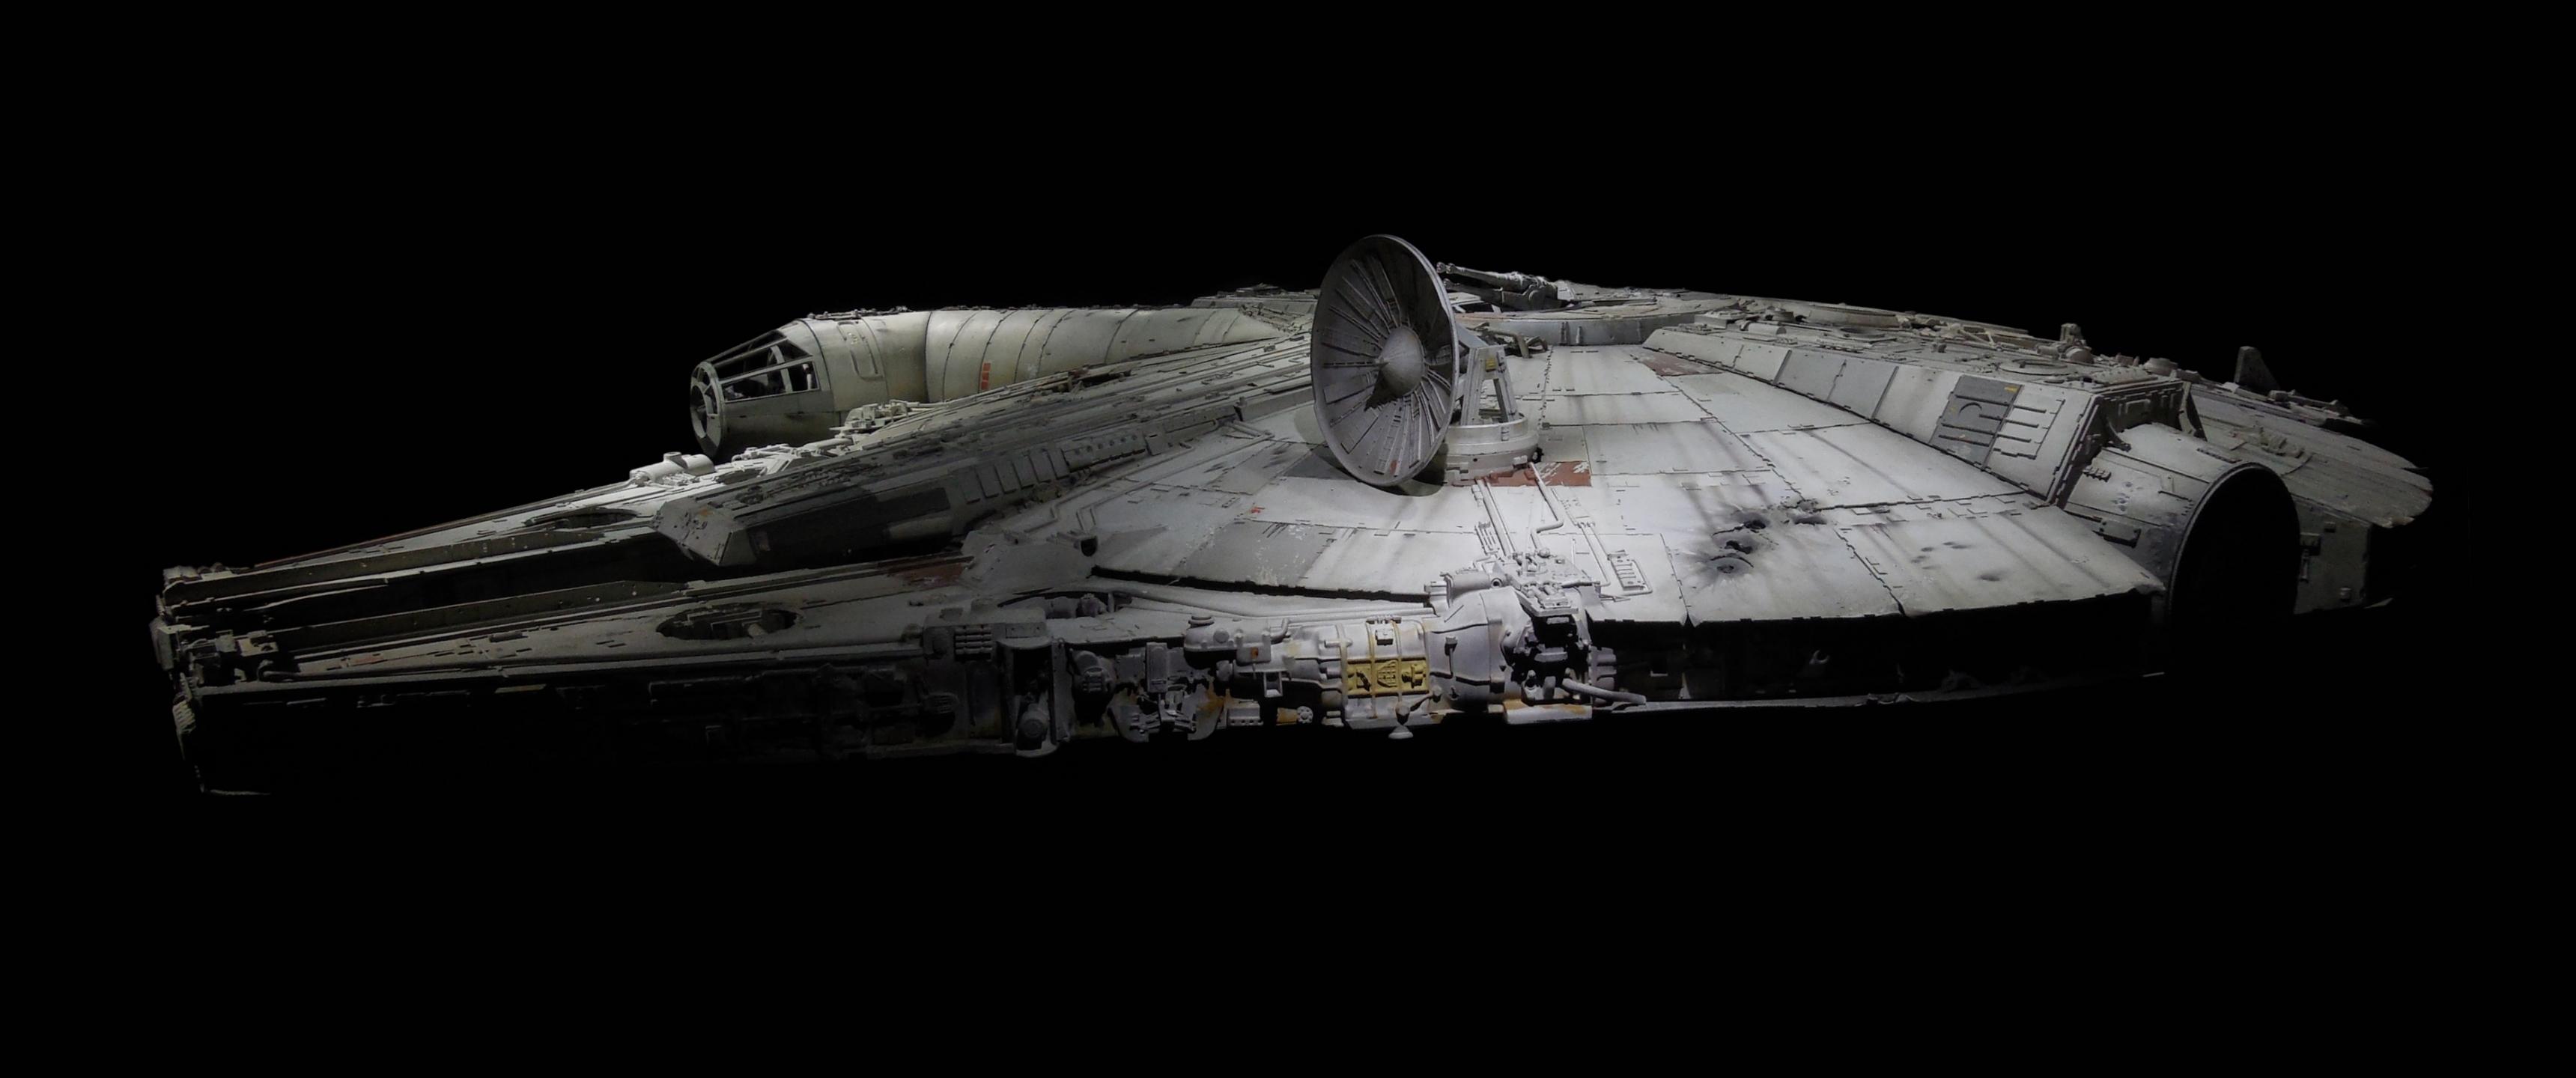 3440x1440 Star Wars Wallpaper Posted By Samantha Johnson